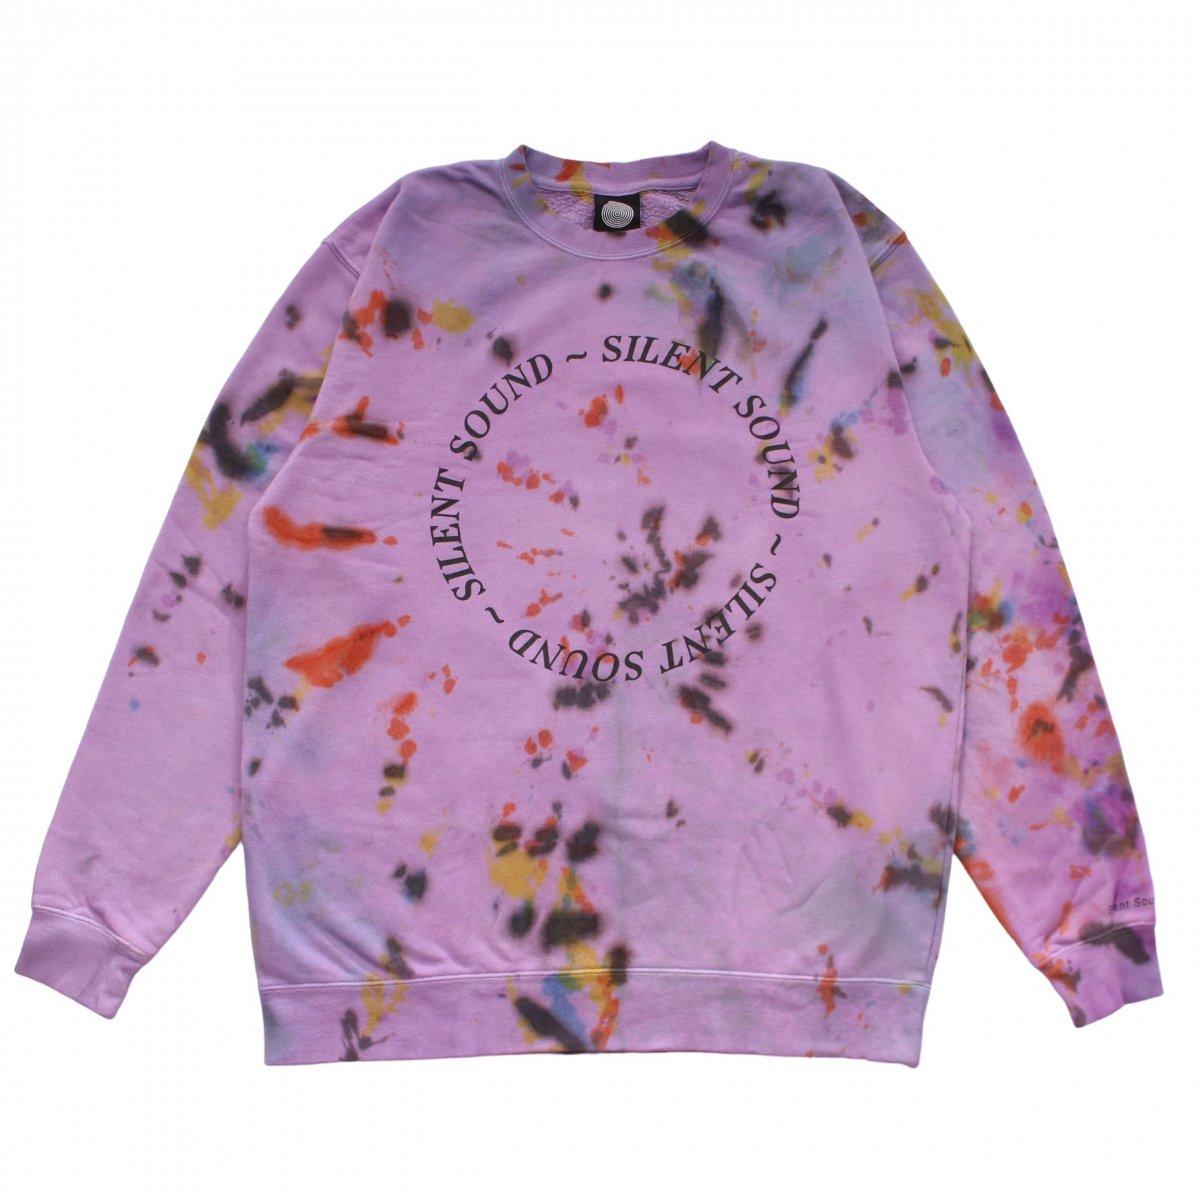 Crewneck Sweatshirt - Circle Logo【Melt Down (Hand Dye)】